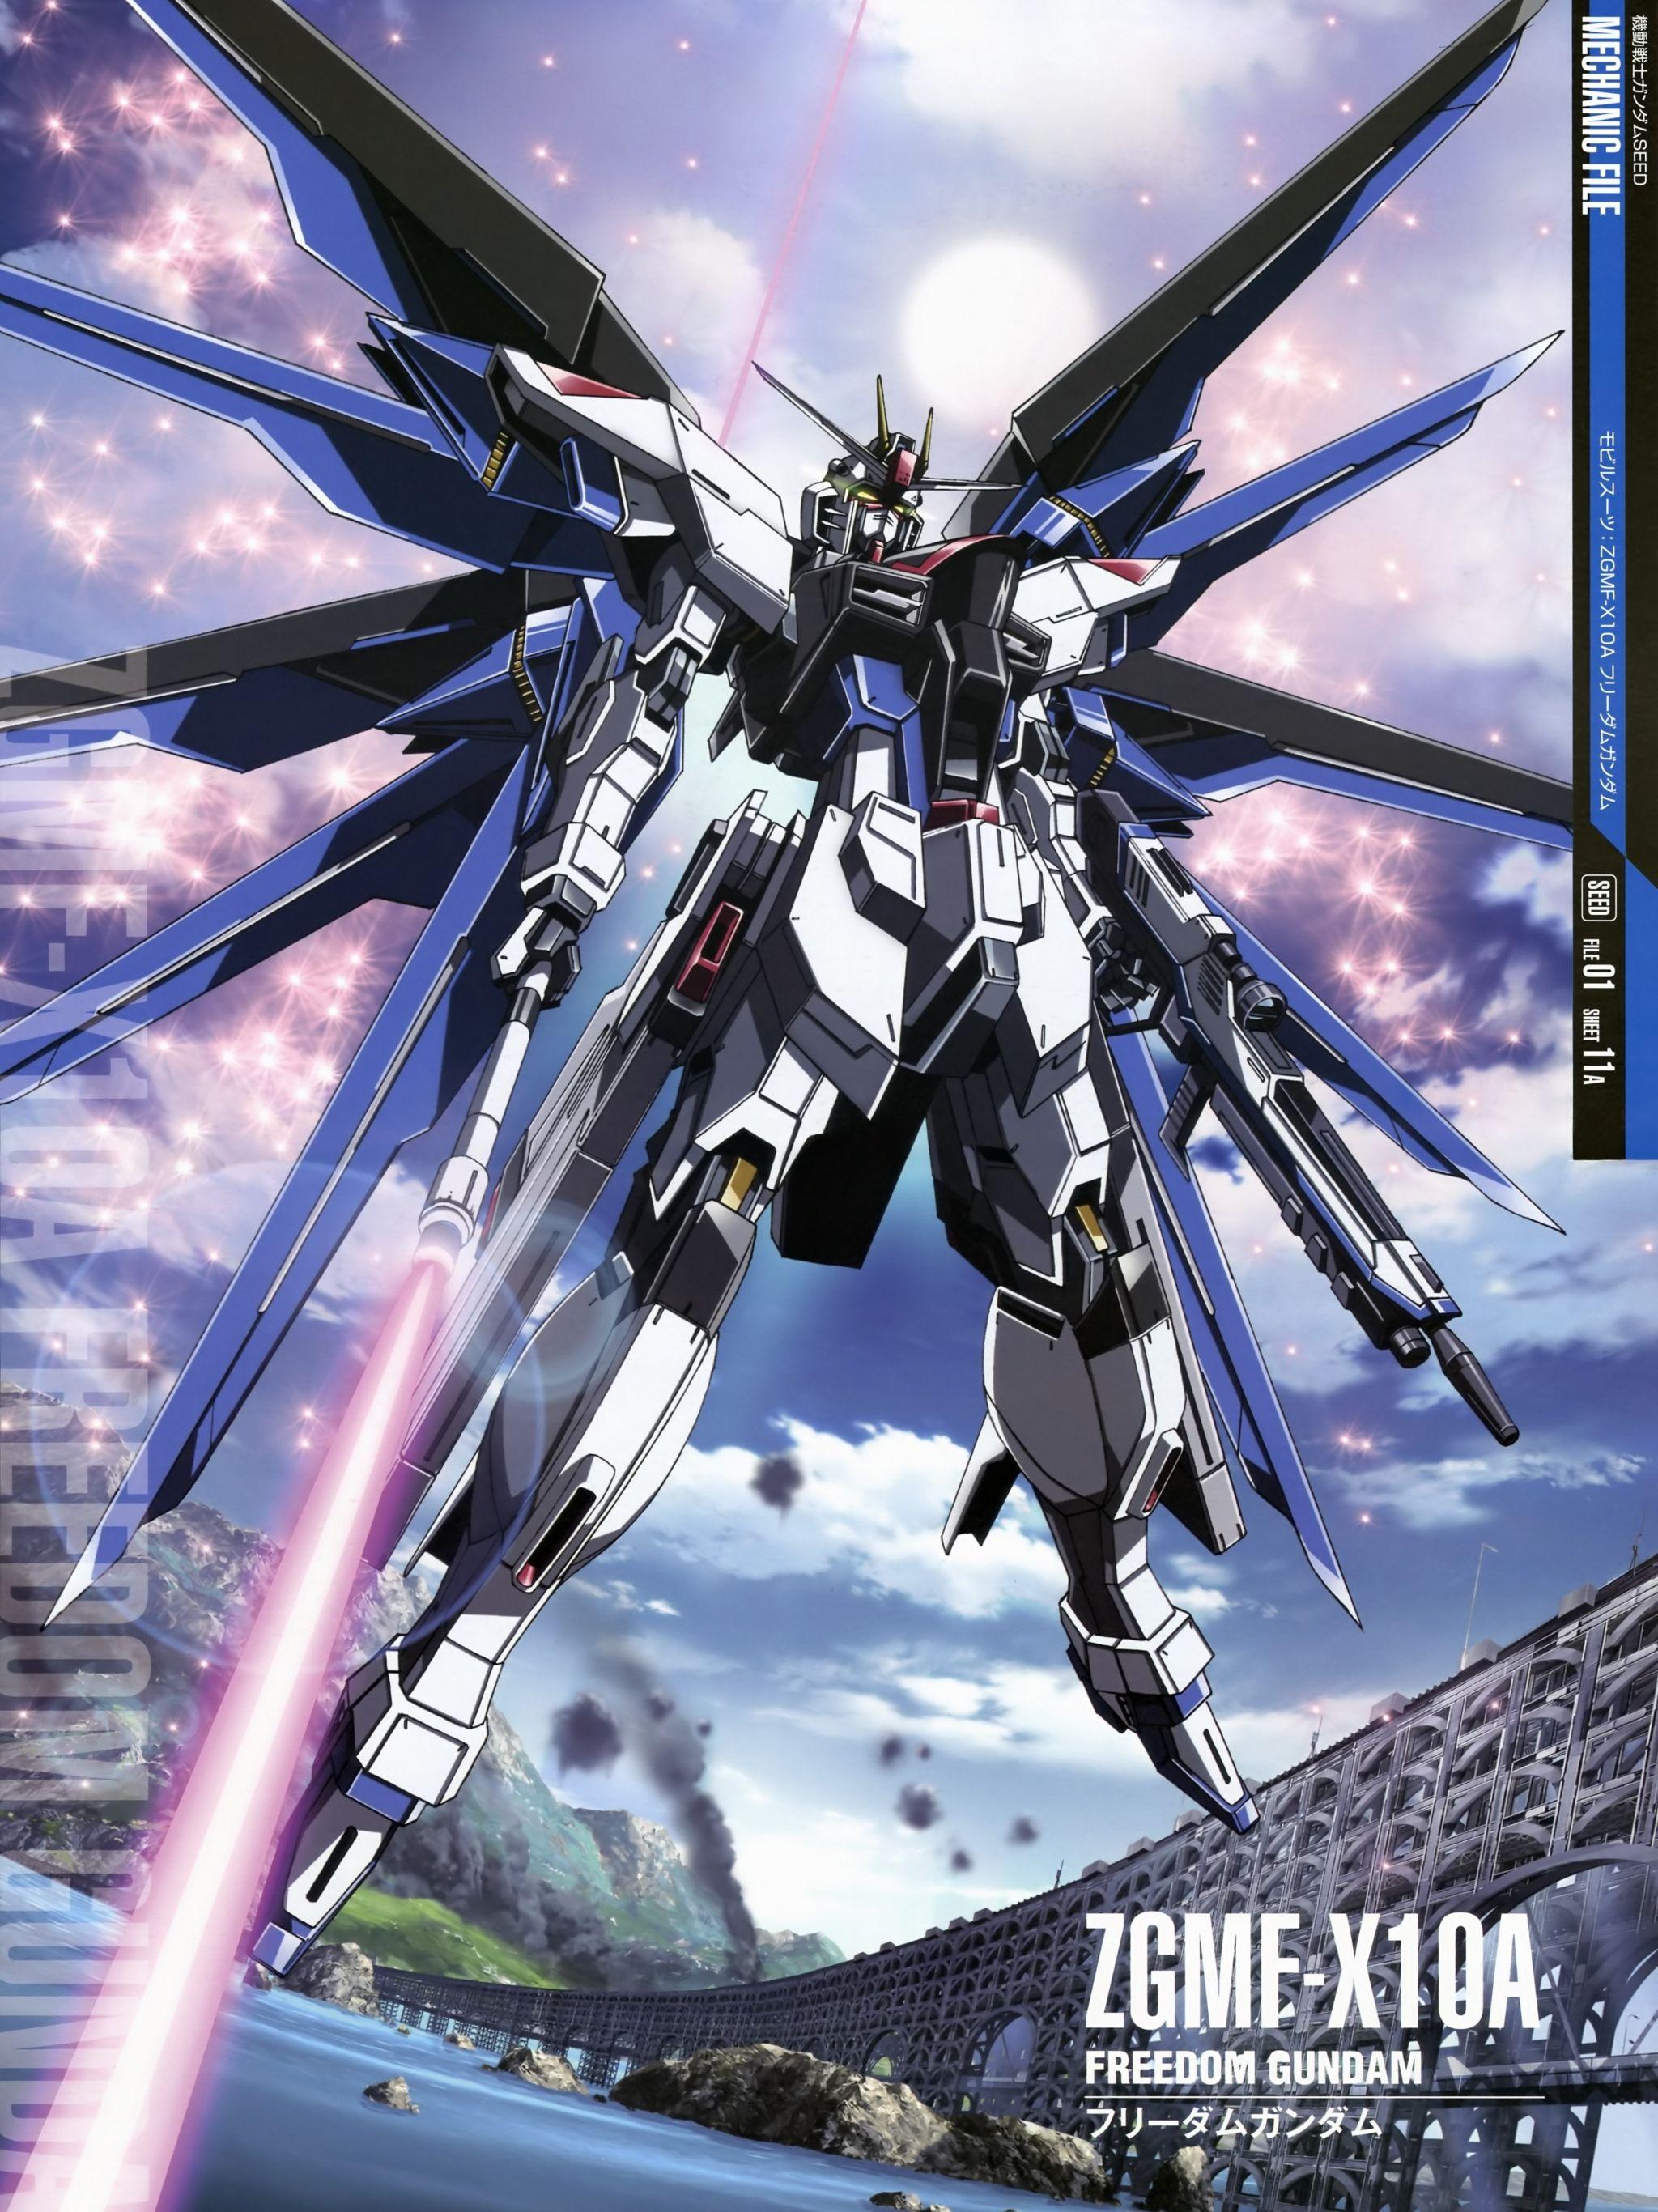 Gundam Wallpaper 1440x2560 Mywallpapers Site In 2020 Gundam Wallpapers Gundam Seed Gundam Art